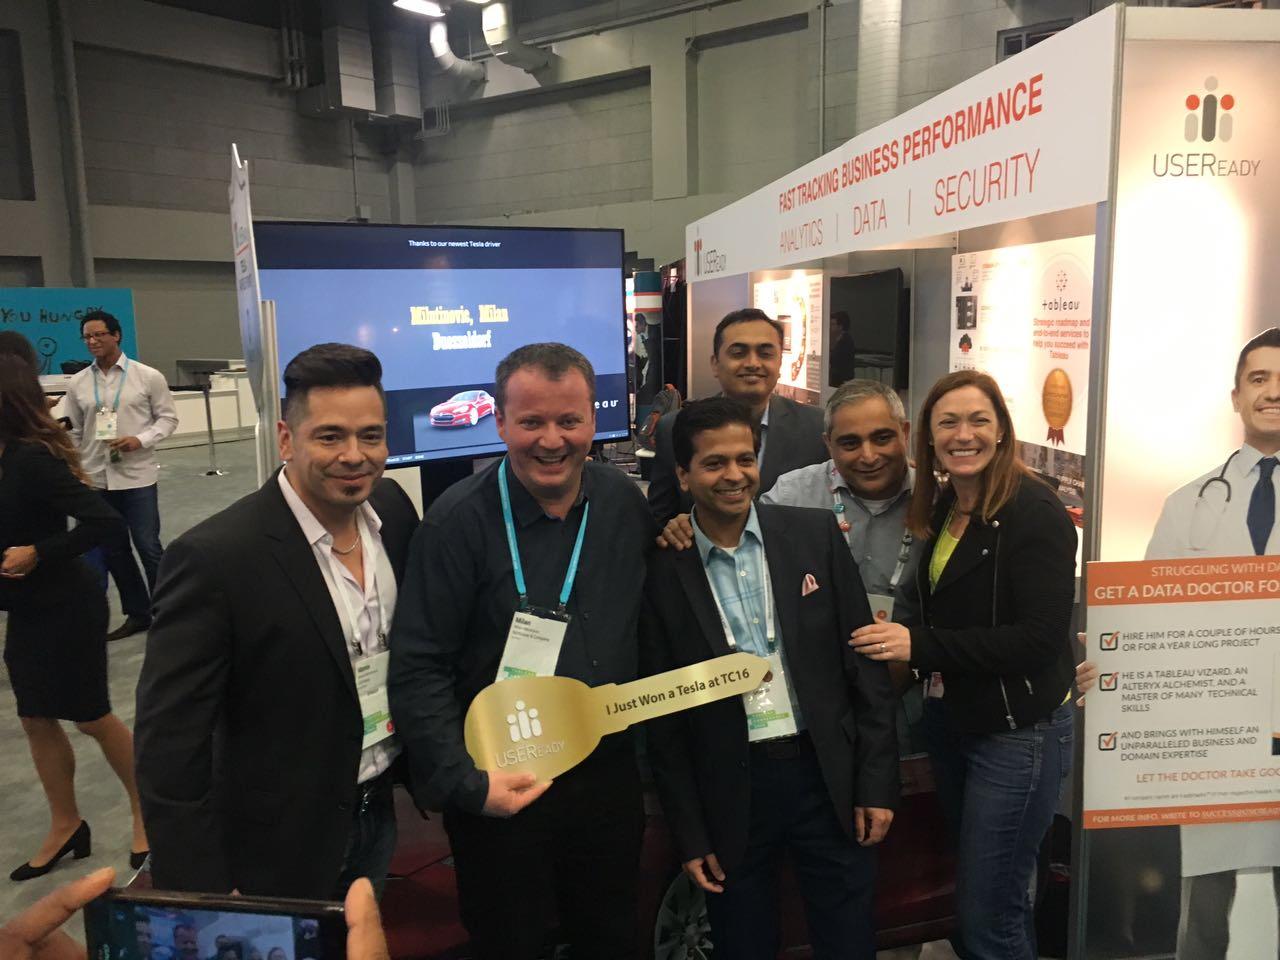 Milan - Winner of USEReady's Tesla raffle with Team USEReady